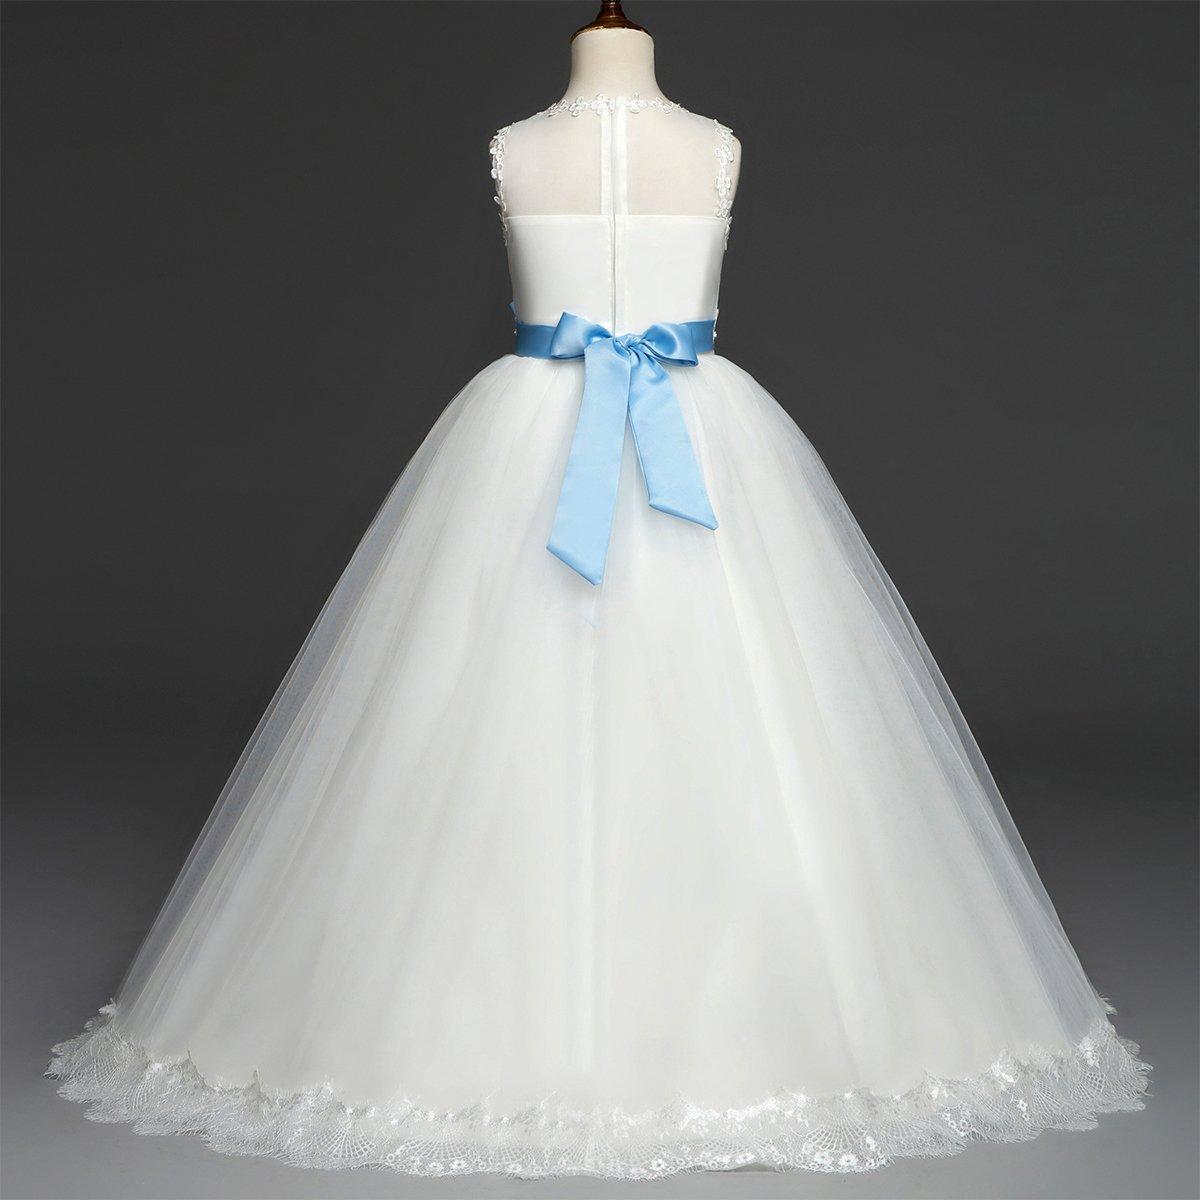 c97dc7bcf Flower Girls Lace Tulle Dress Wedding Bridesmaid Communion Evening ...